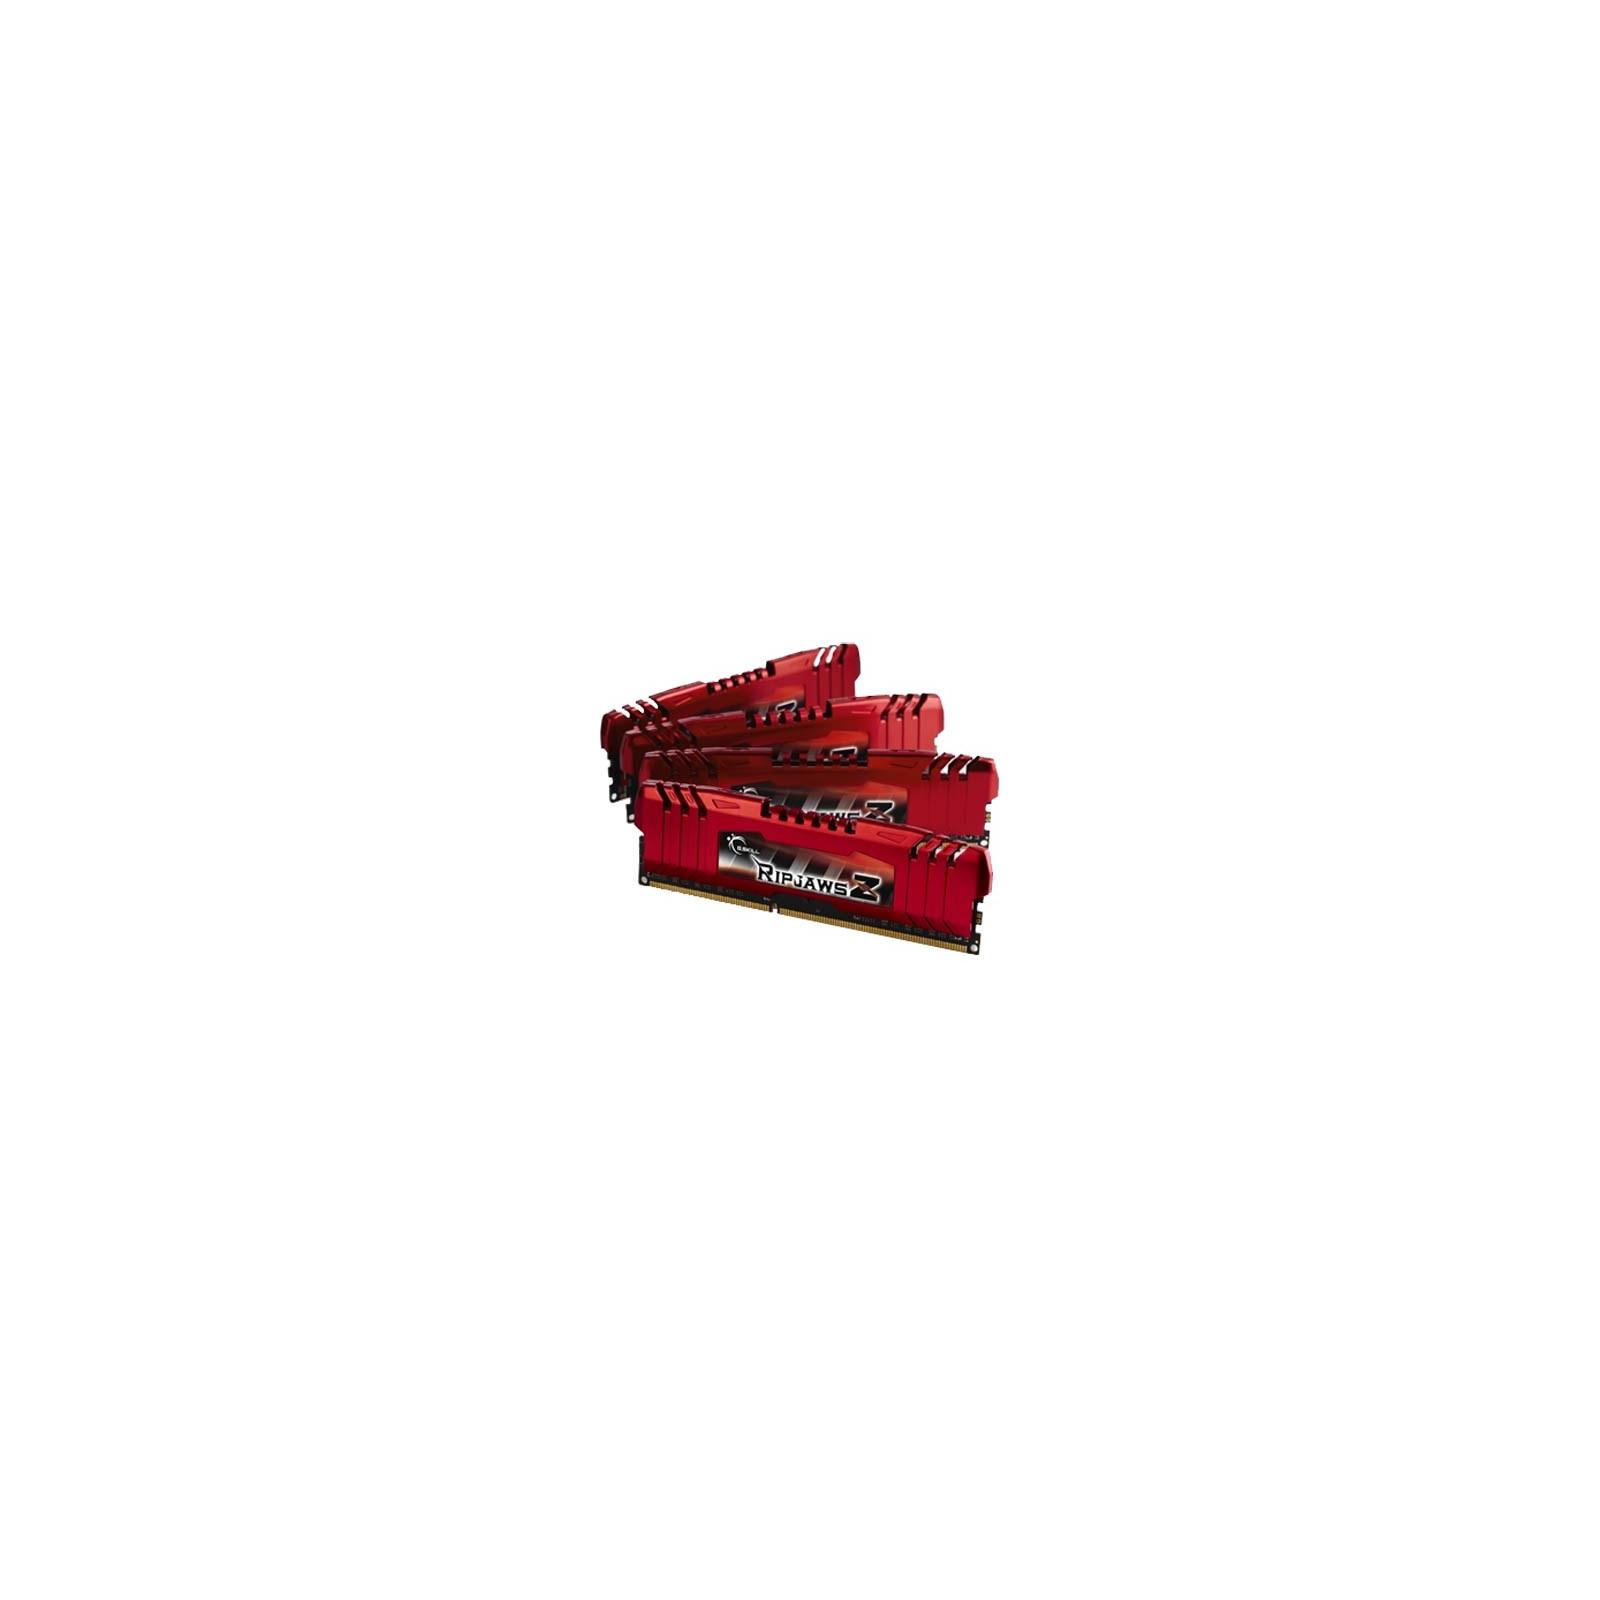 Модуль памяти для компьютера DDR3 32GB (4x8GB) 2133 MHz G.Skill (F3-2133C11Q-32GZL)